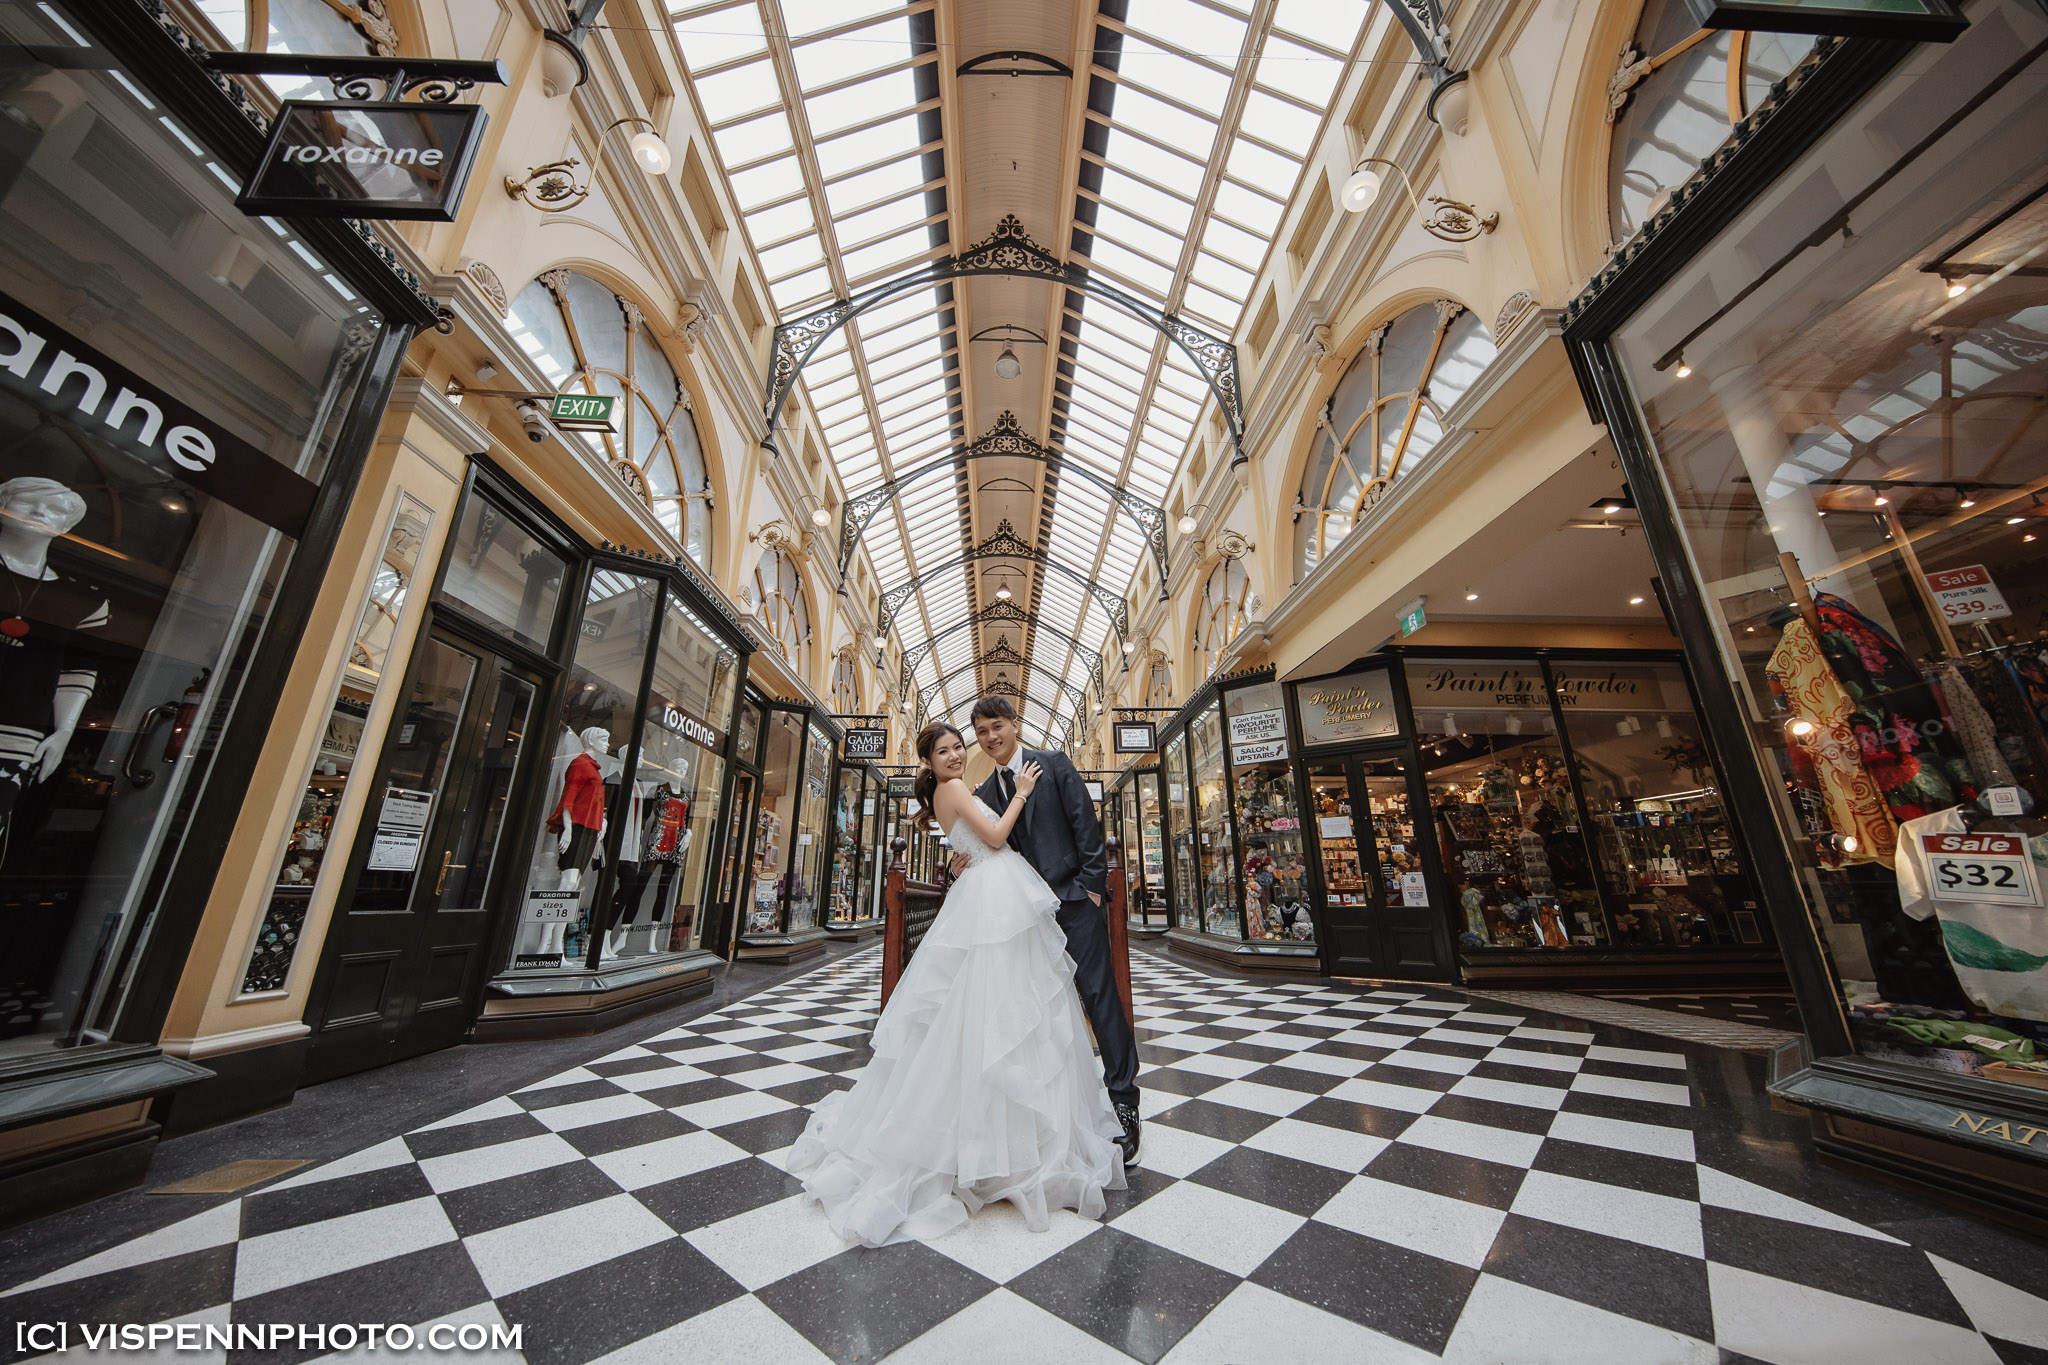 PRE WEDDING Photography Melbourne GiGi 6032 EOSR ZHPENN